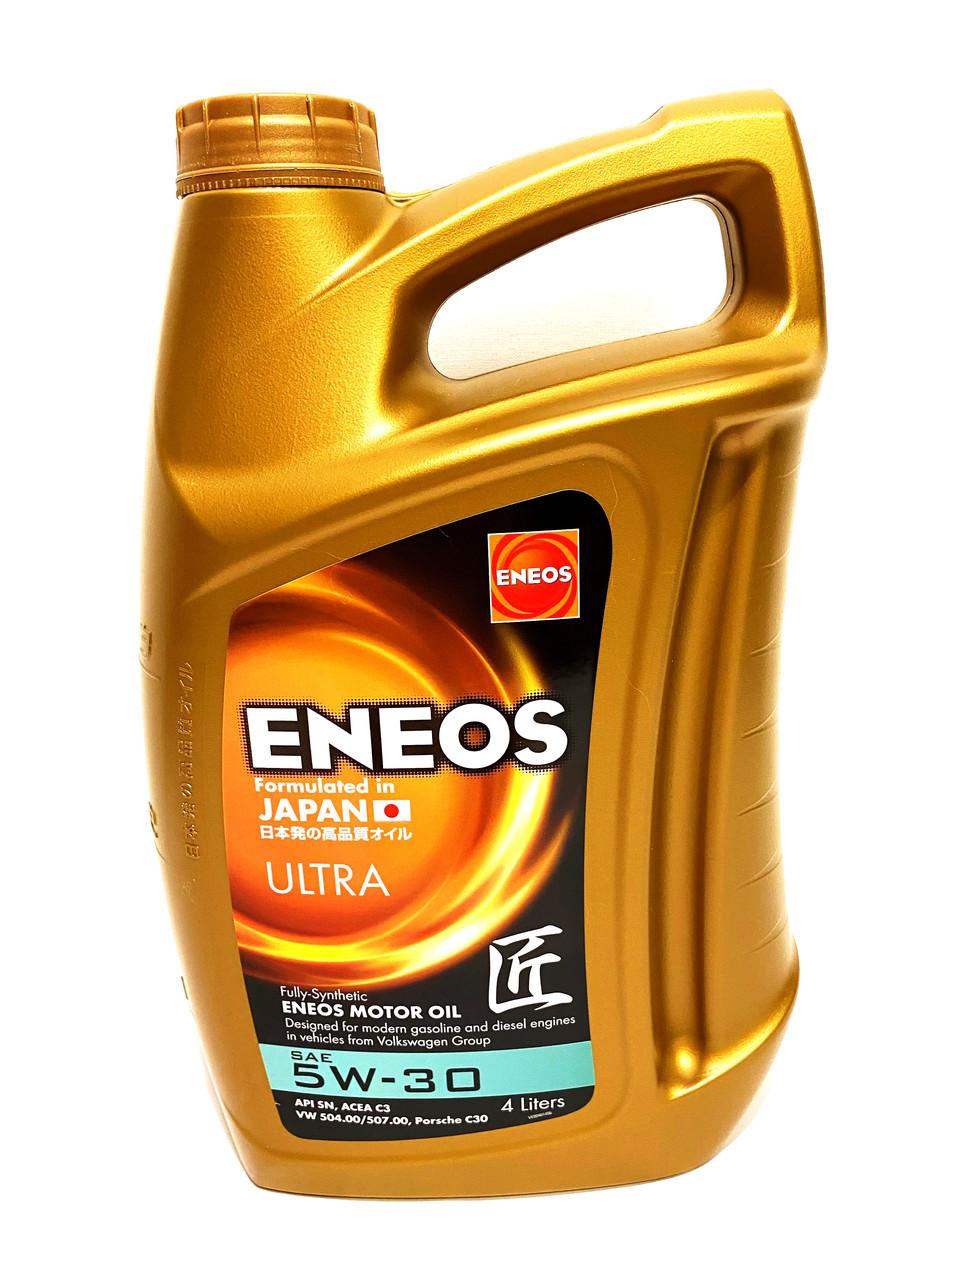 Синтетическое моторное масло ENEOS ULTRA 5W-30, 4л